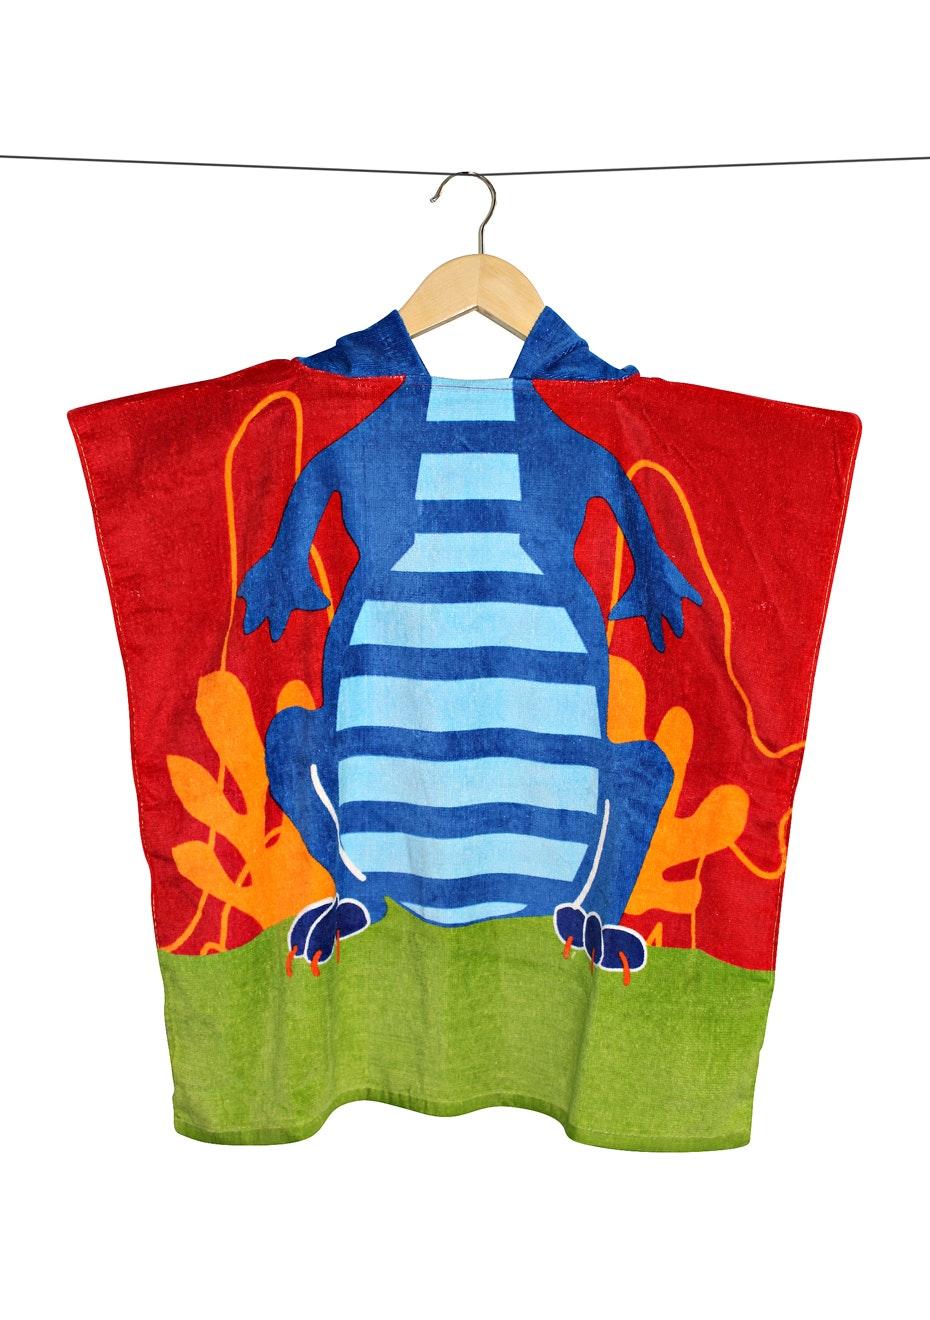 100% Cotton Kids Poncho 60x120cm Neck Size 5.5cm - Crocodile